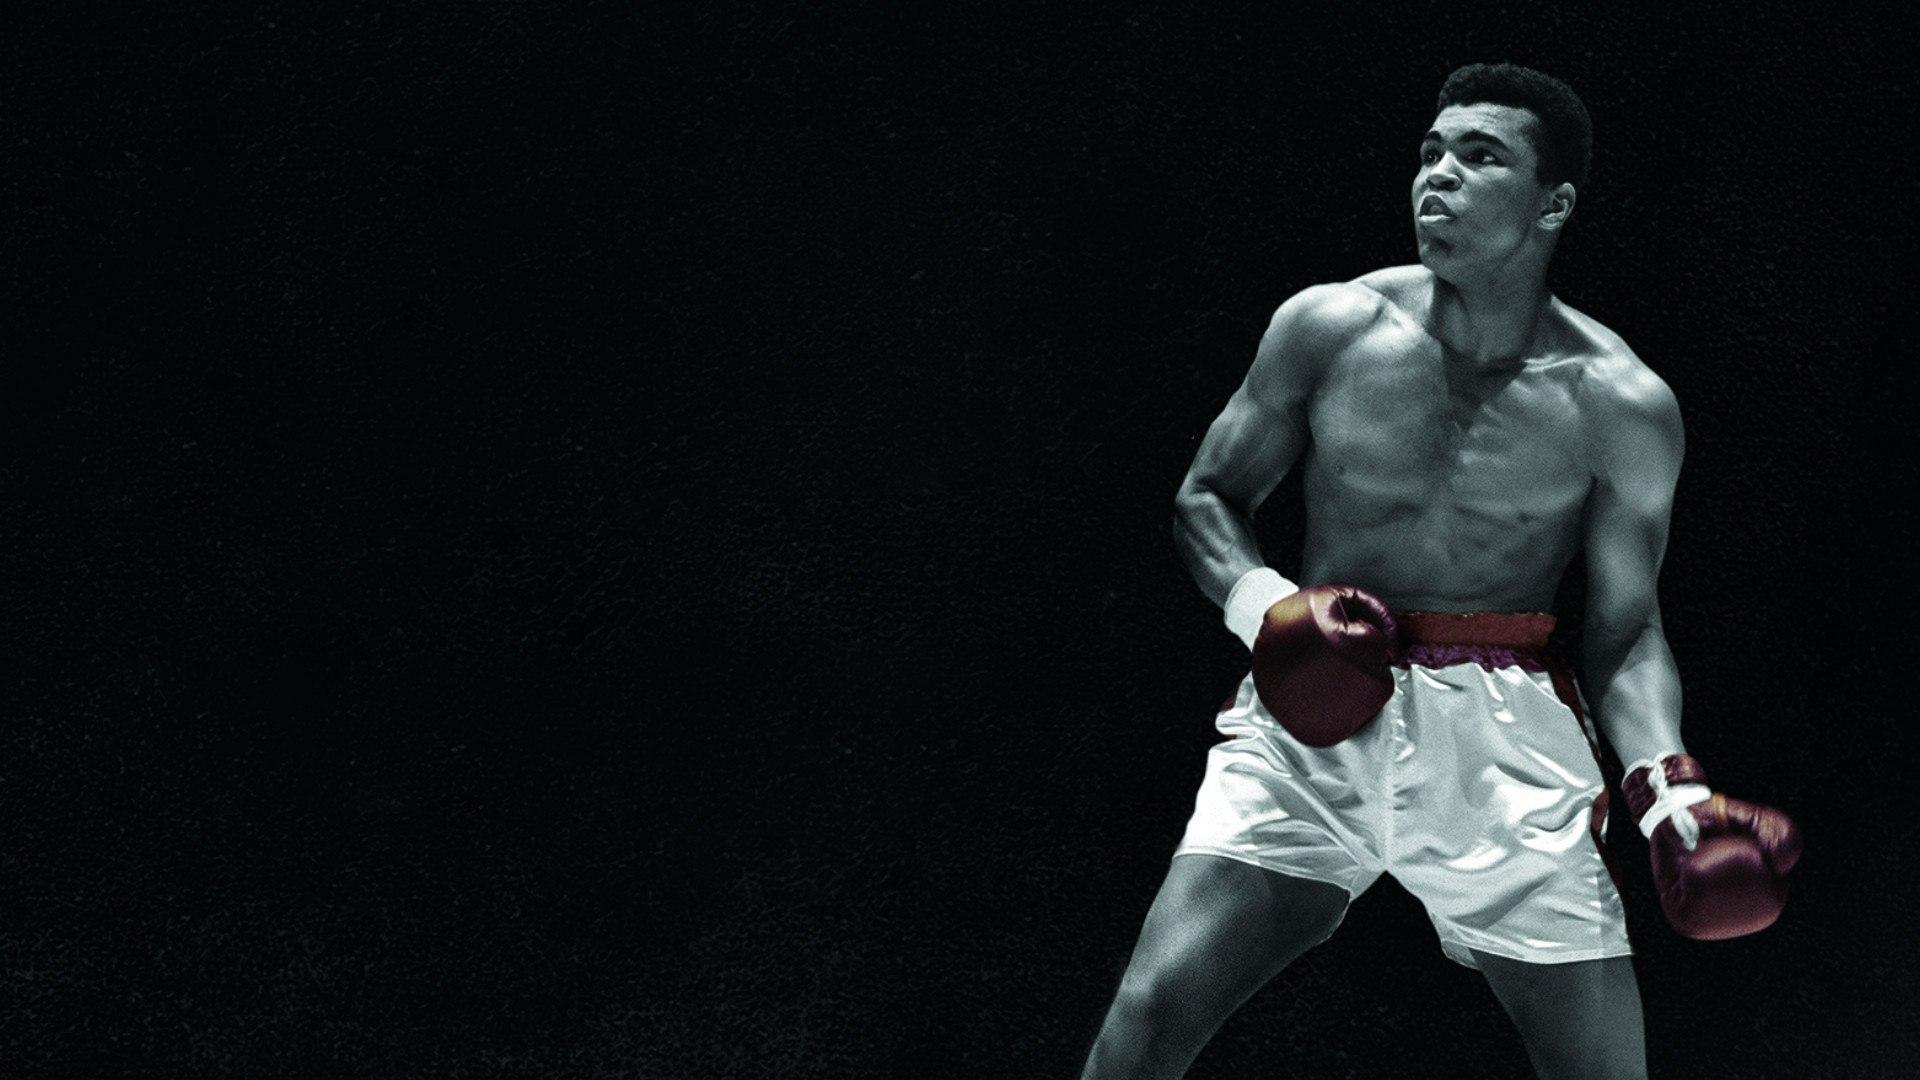 Sky Arte HD What's My Name - Muhammad Ali - -